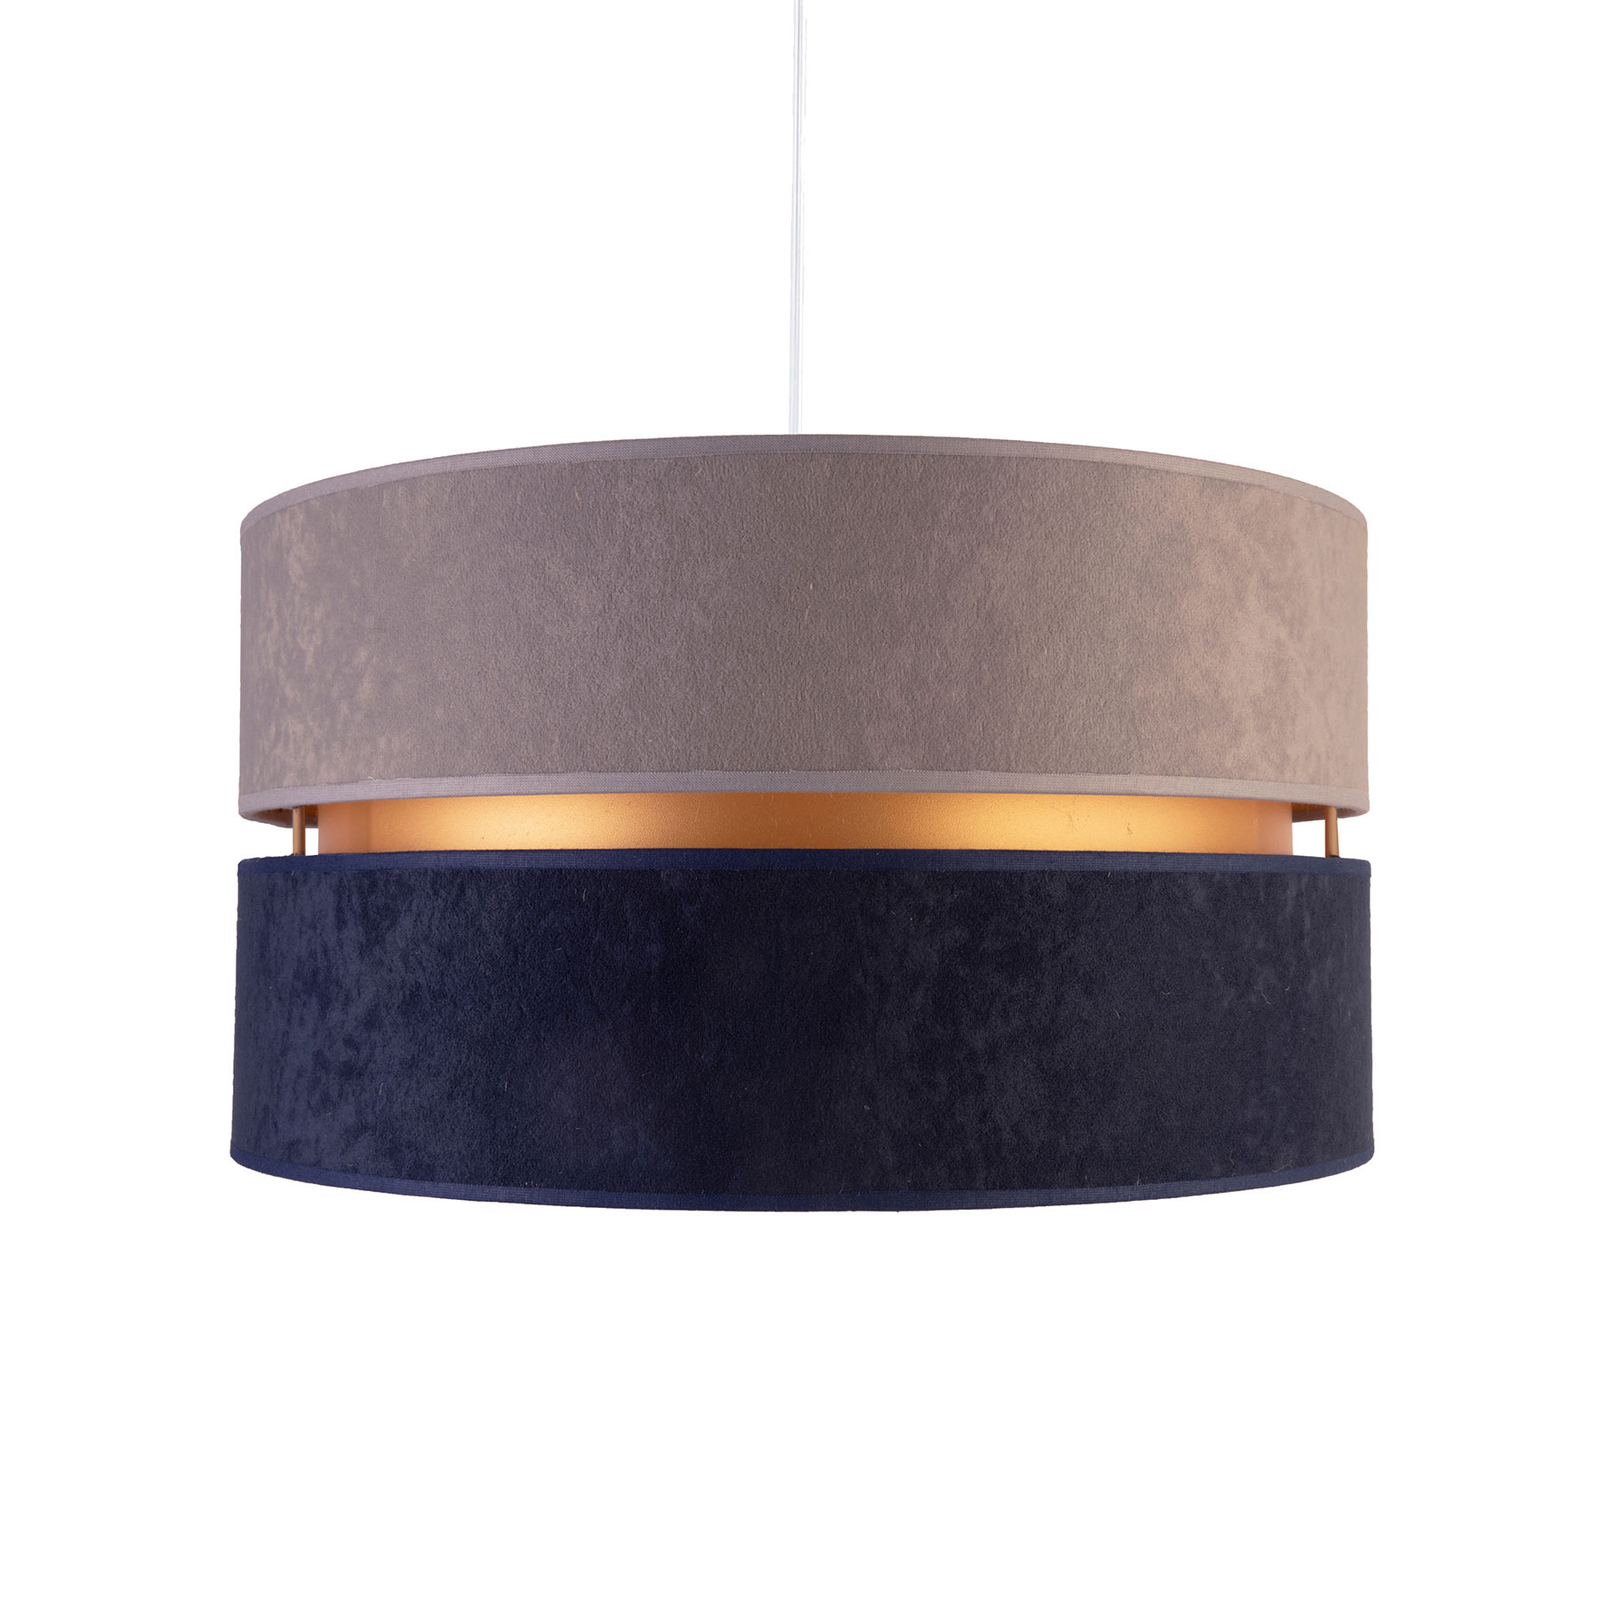 Duo hanging light, navy blue/grey/gold_2616020_1